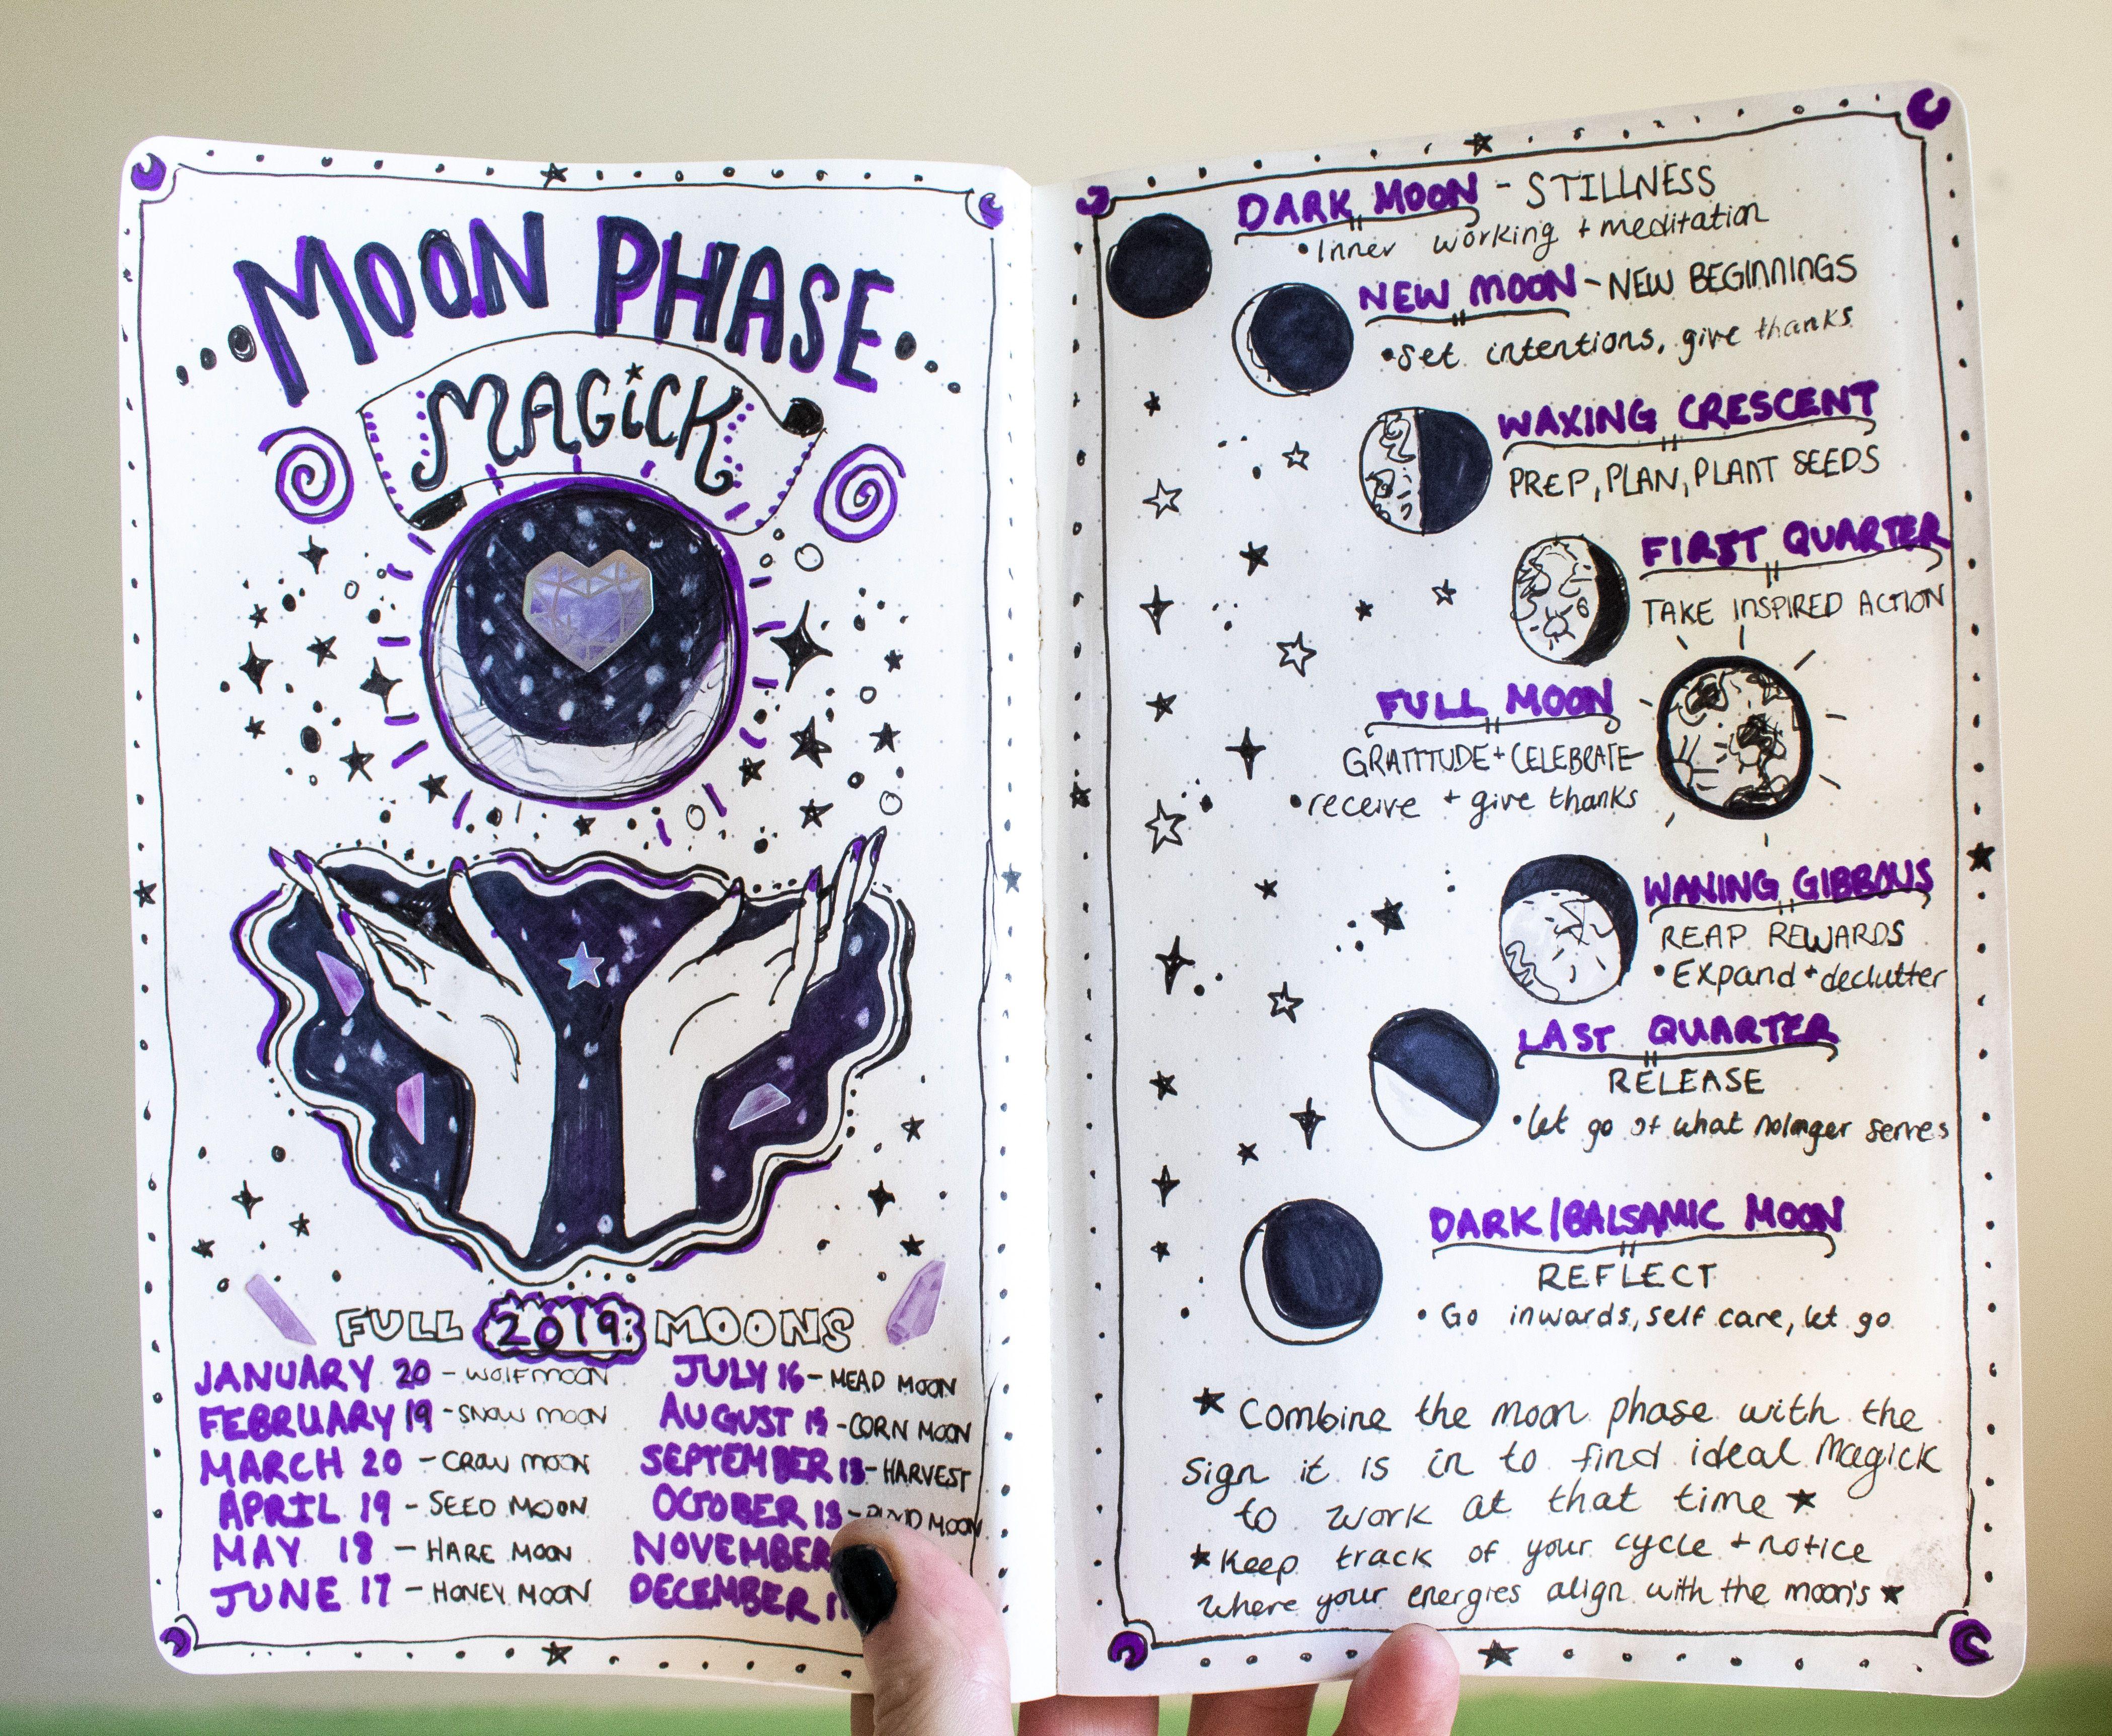 Moon phase magick